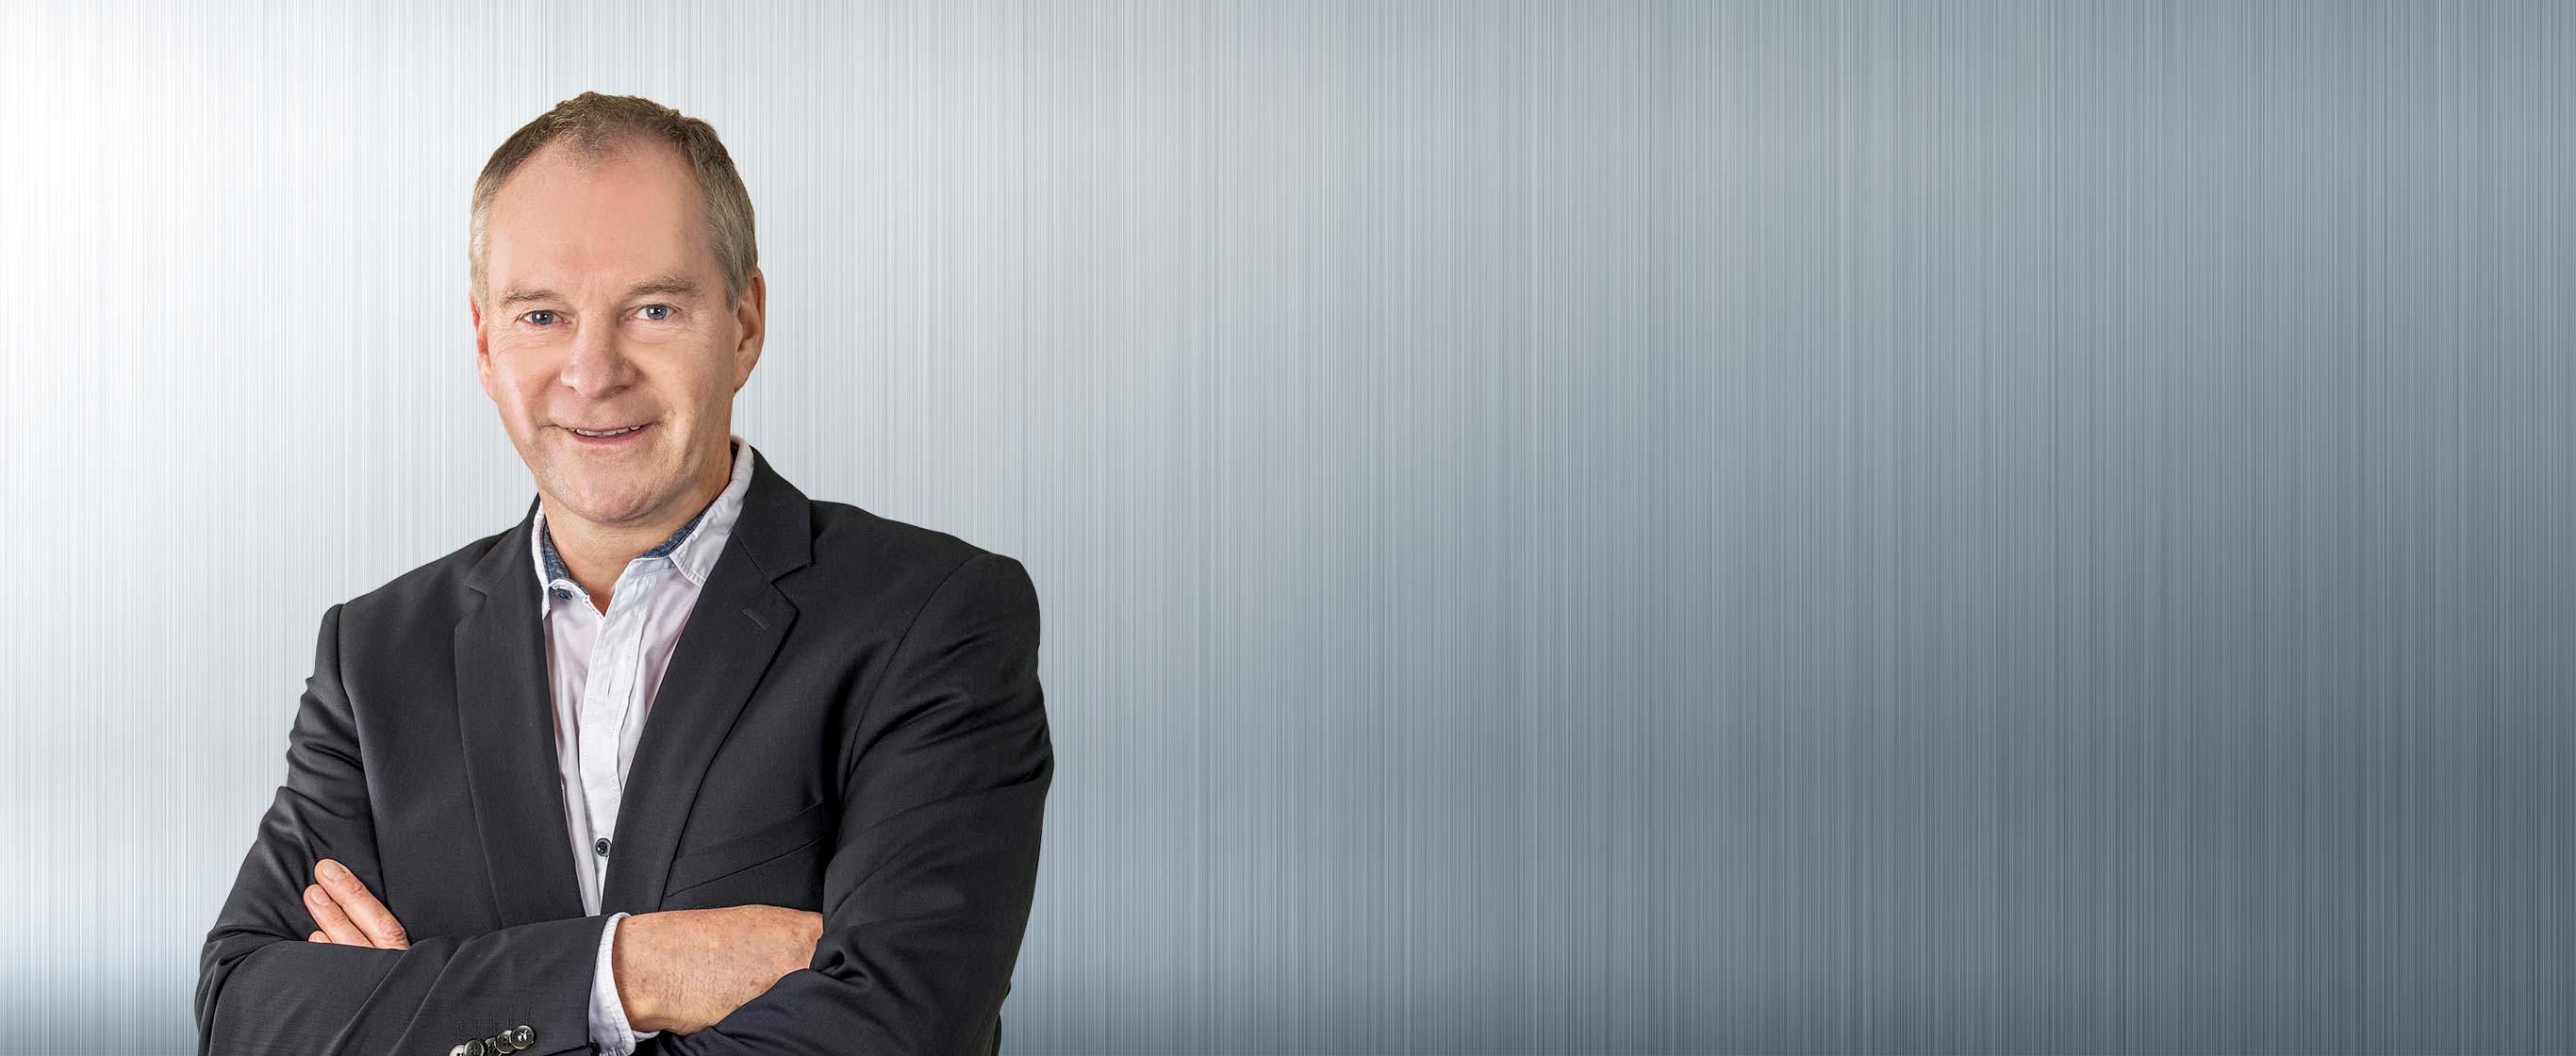 Hans Rost, Geschäftsführer